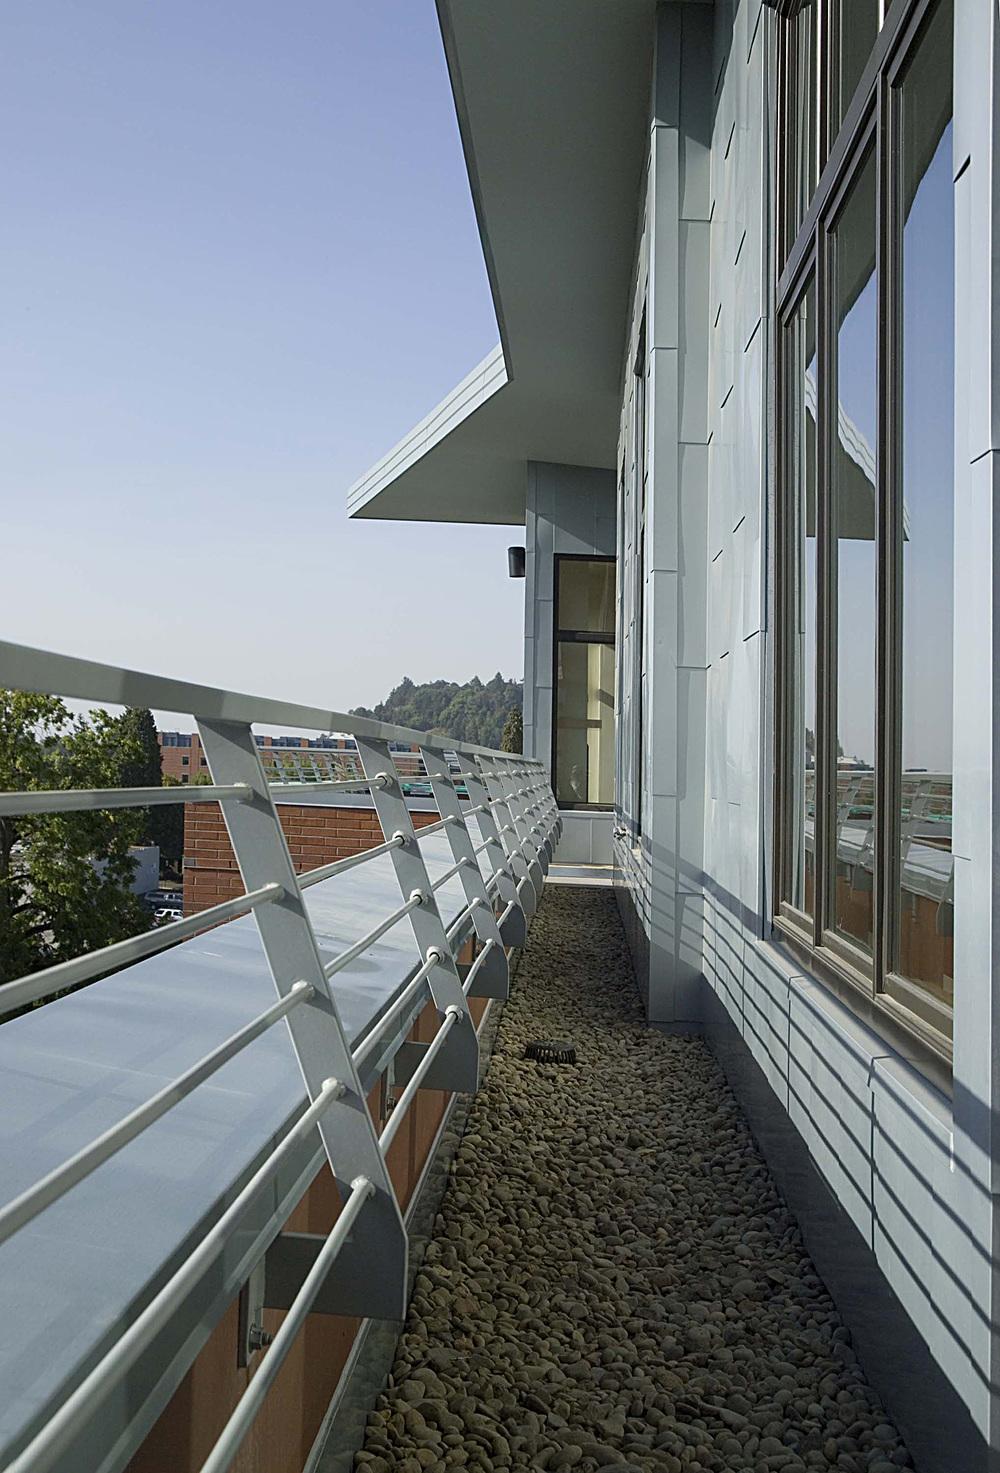 wT ext.balcony detail day.jpg